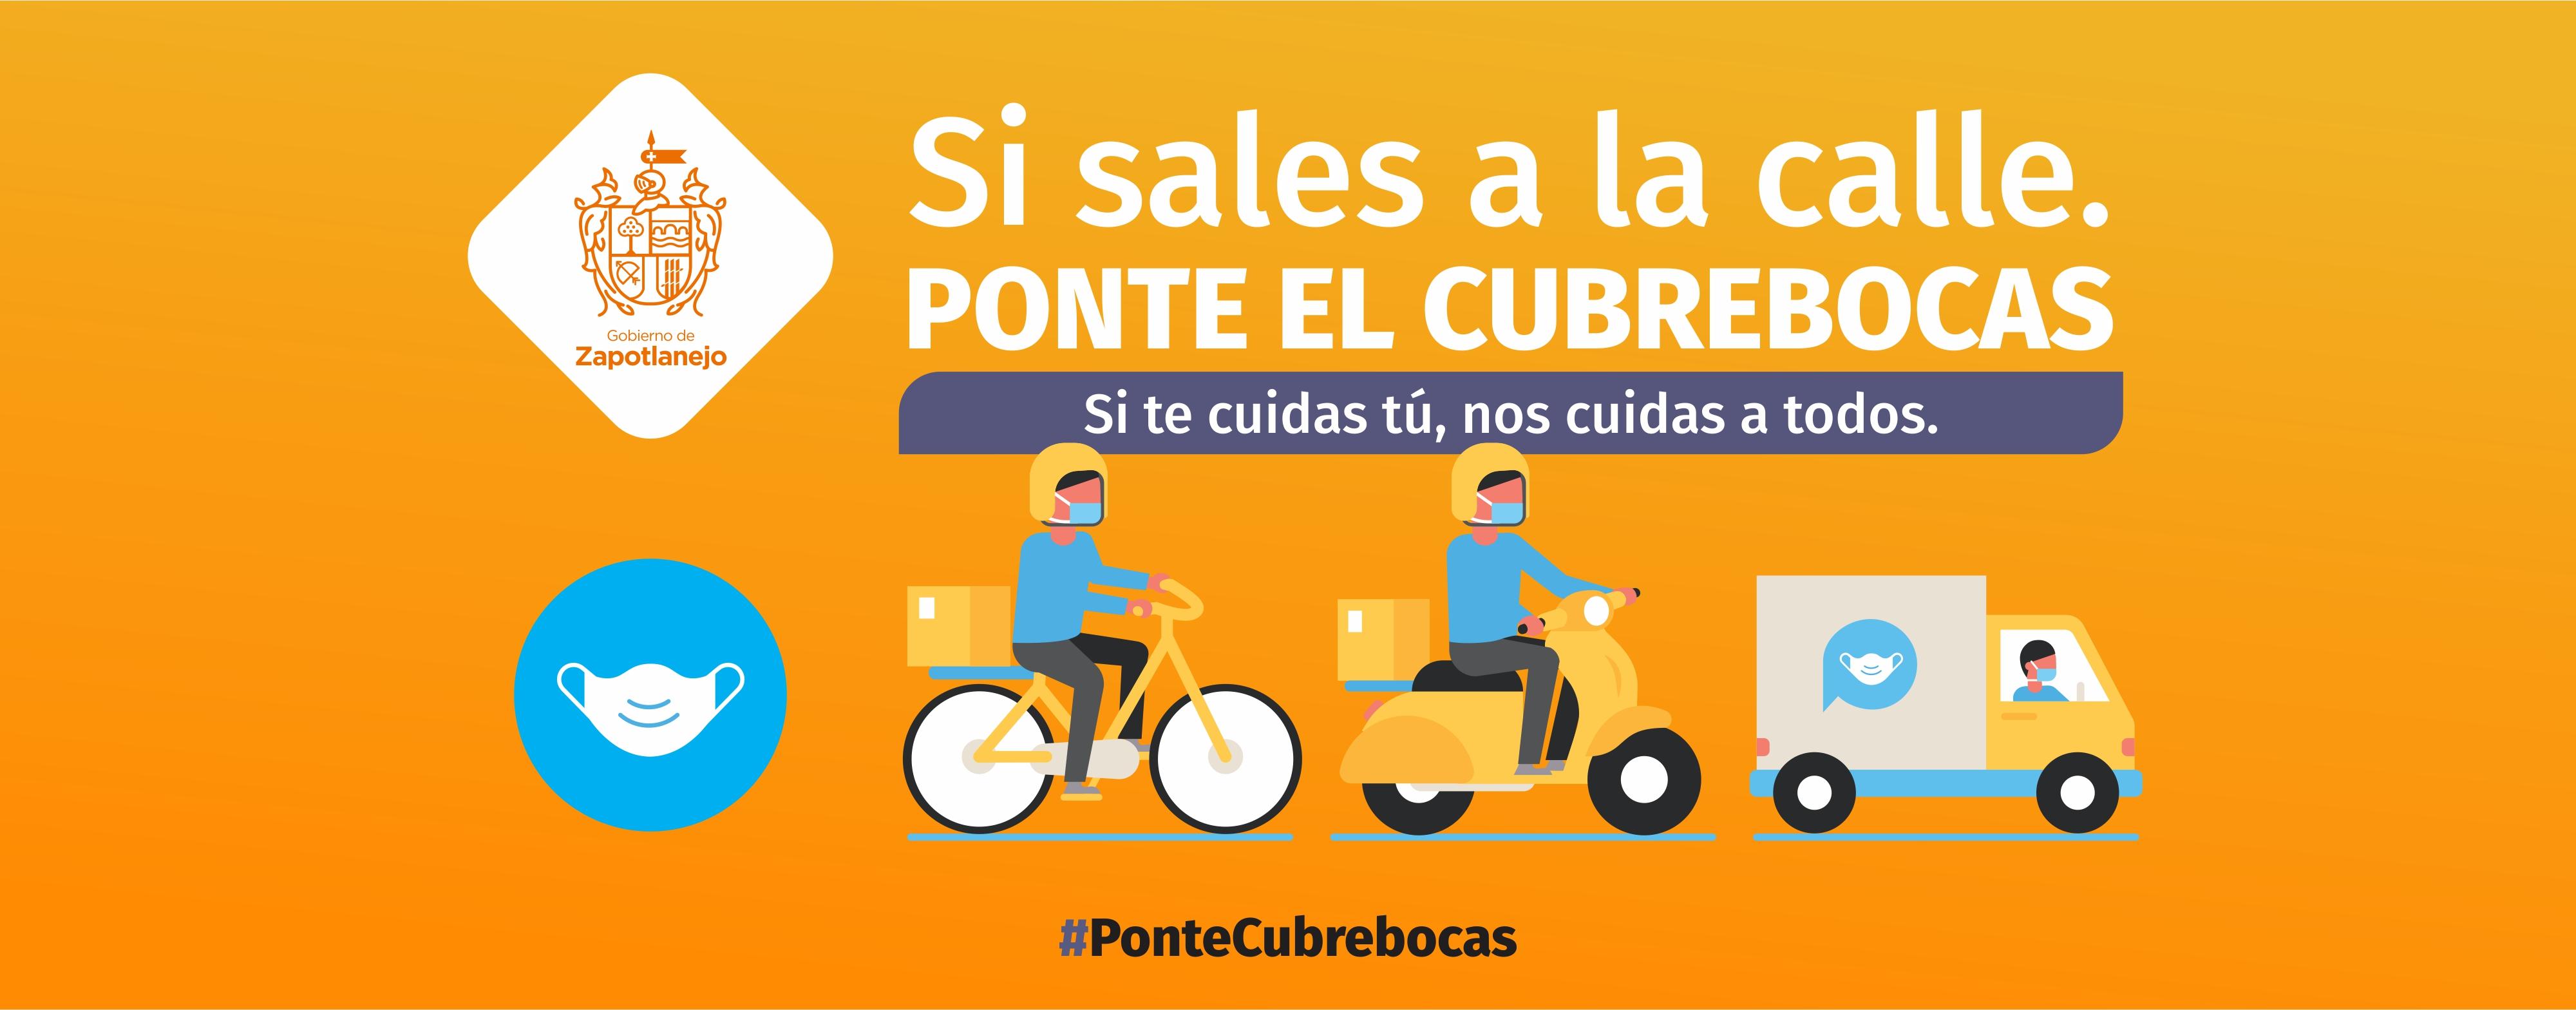 cubrebocas2.jpg